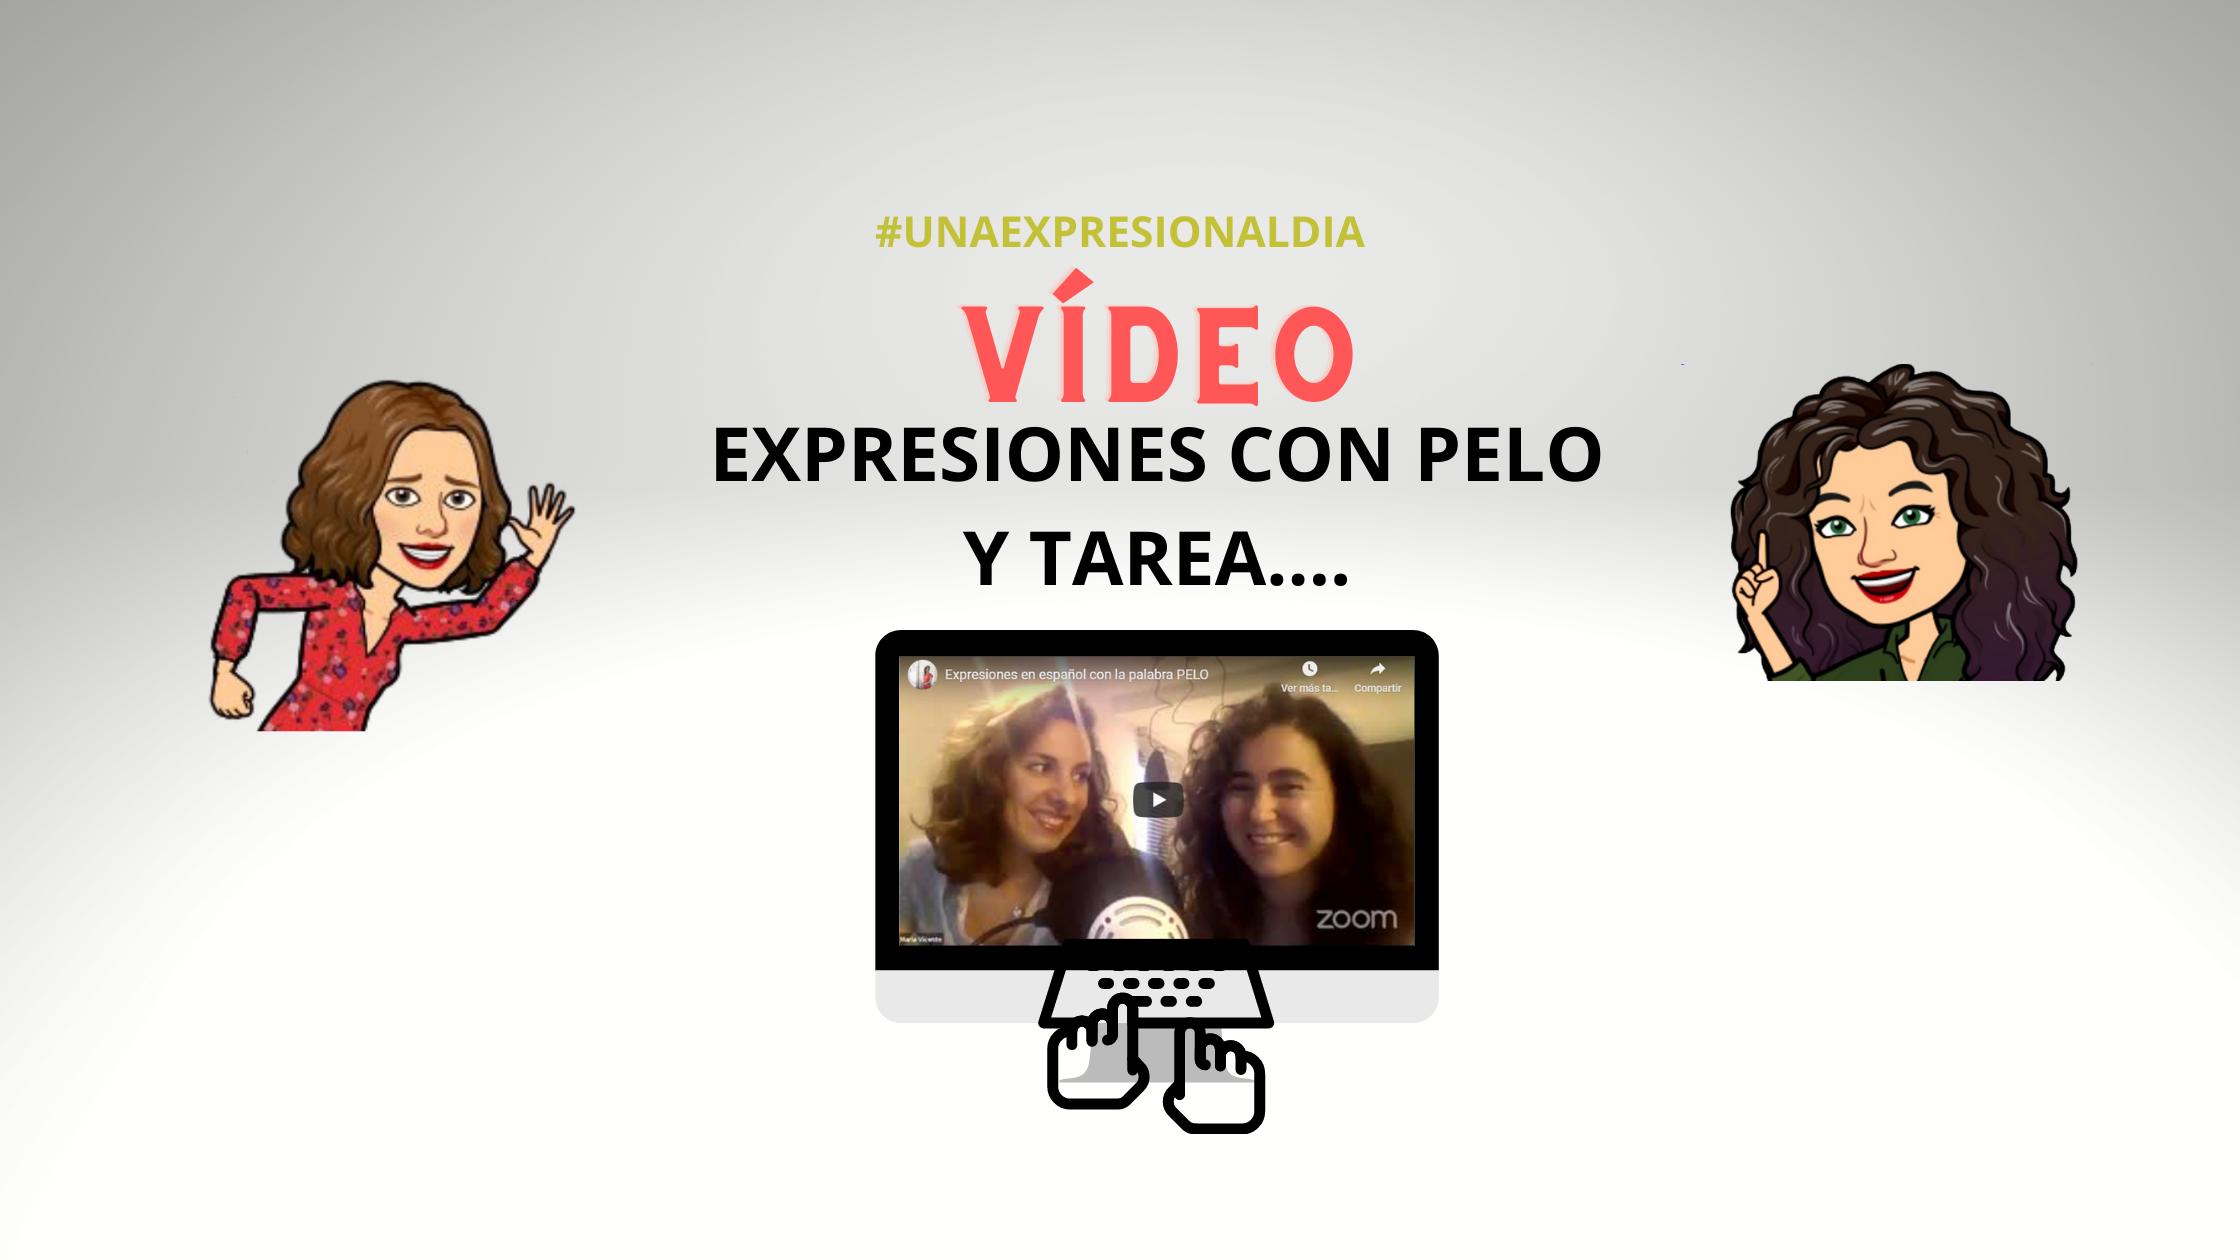 Copy of TAREA UNA EXPRESION AL DIA PATA (3)